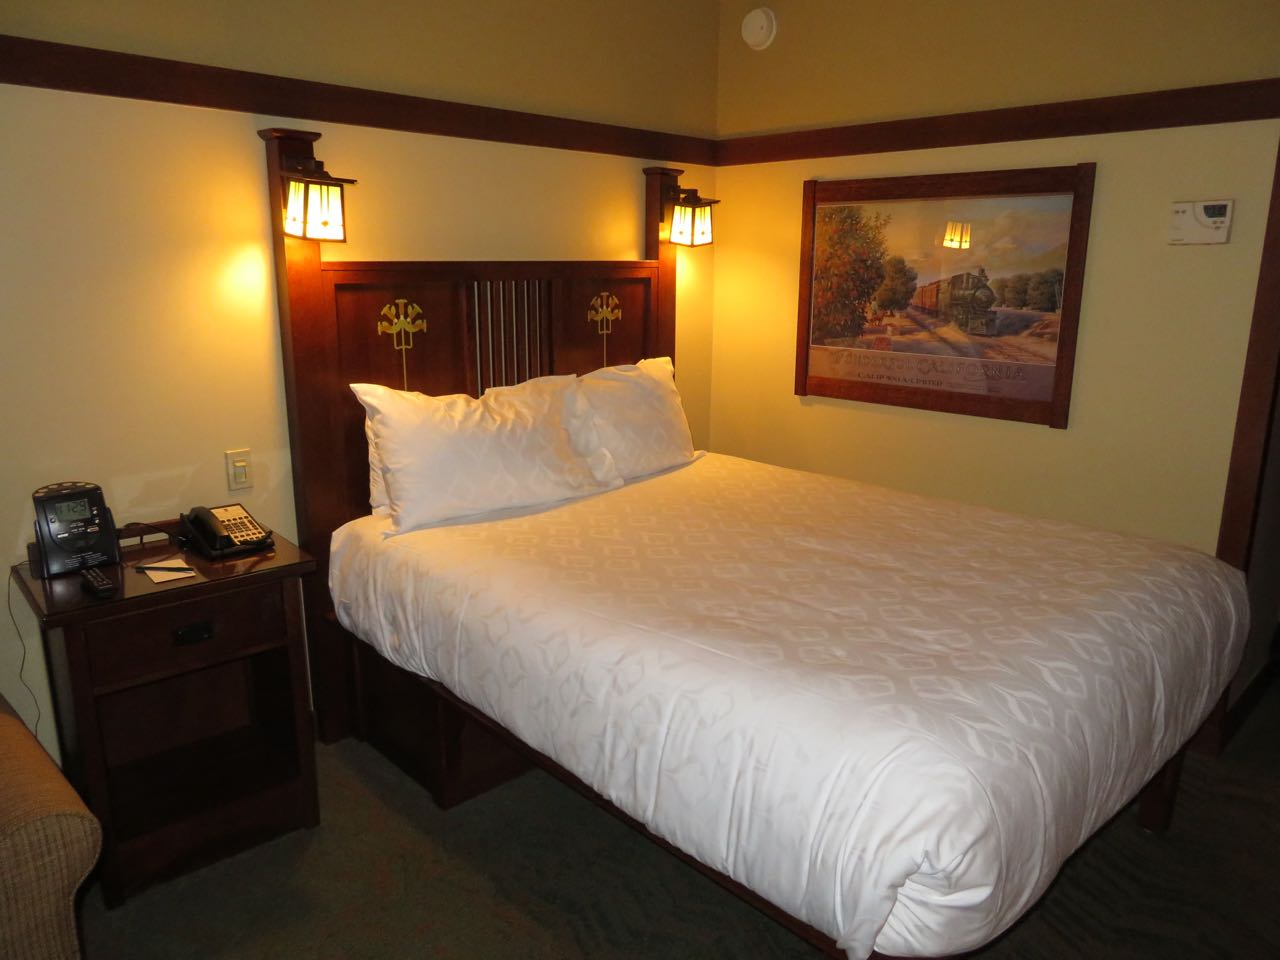 Learn more about Disney's Grand Californian Resort | PassPorter.com